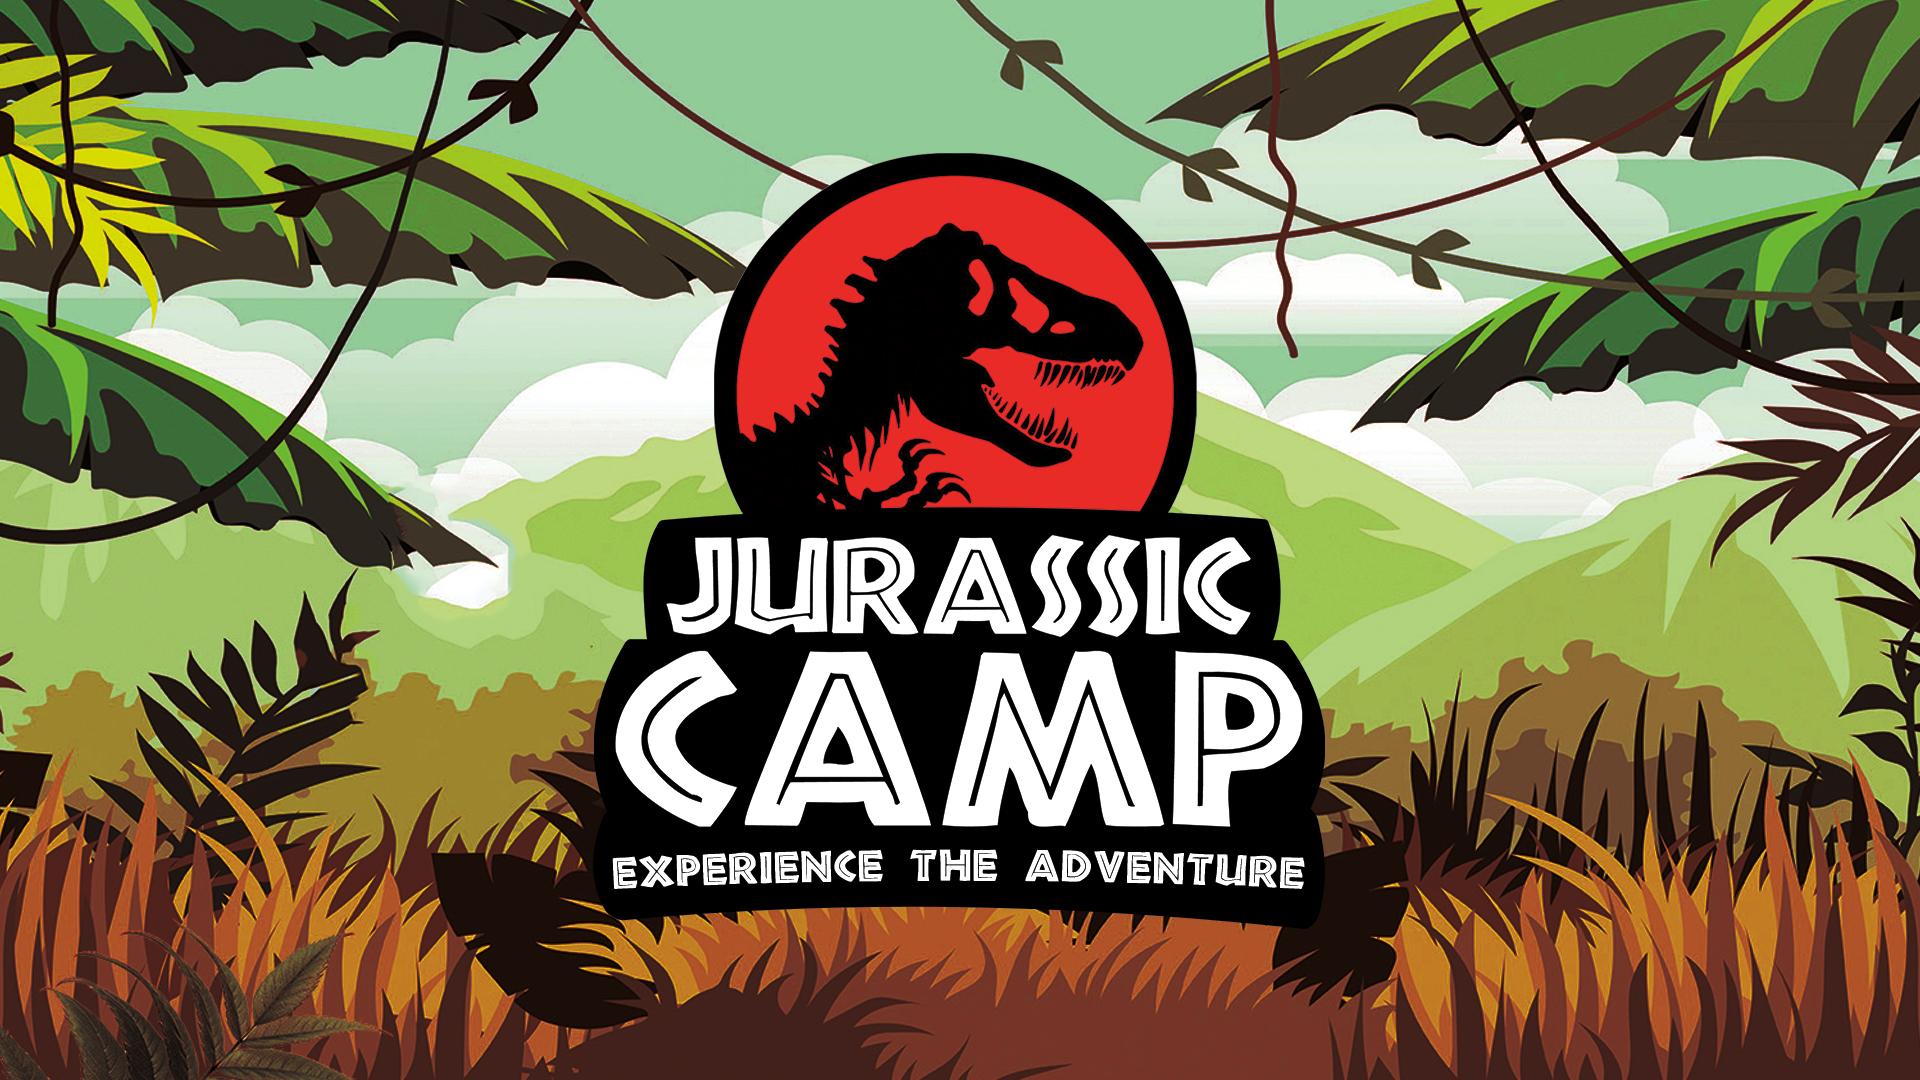 Jurassic camp event cover